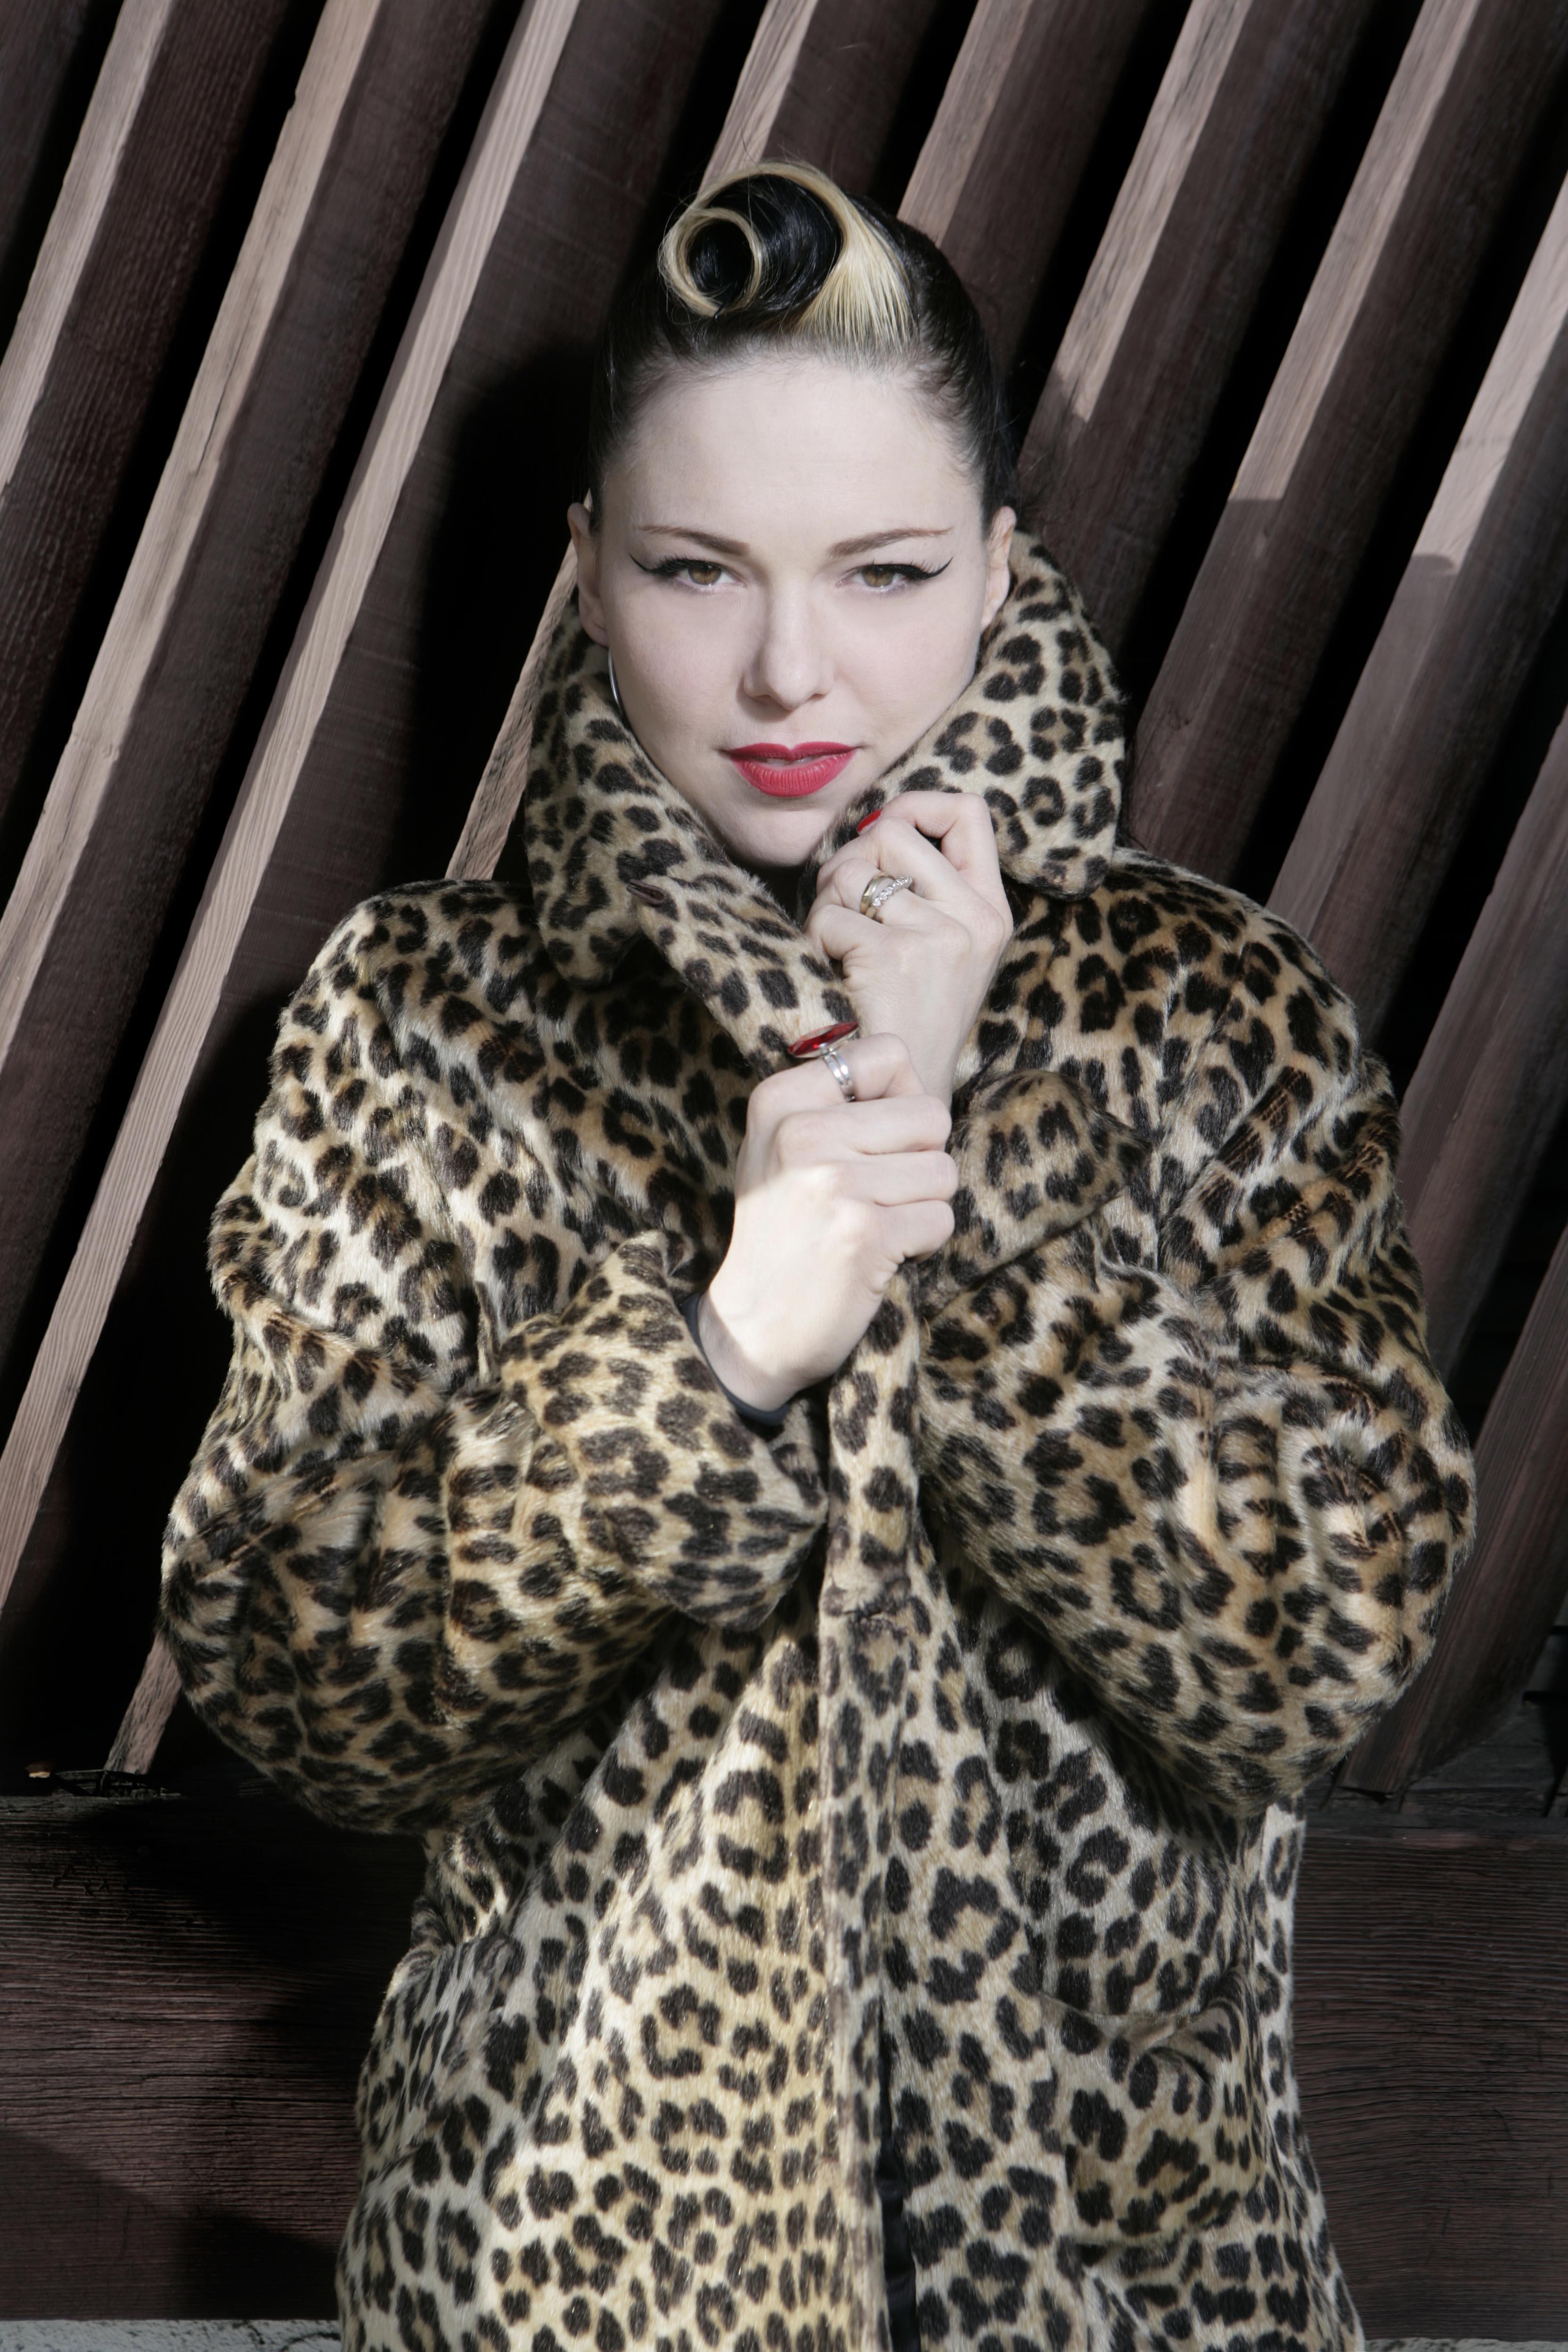 Imelda May To Perform At Bristol International Jazz & Blues Festival